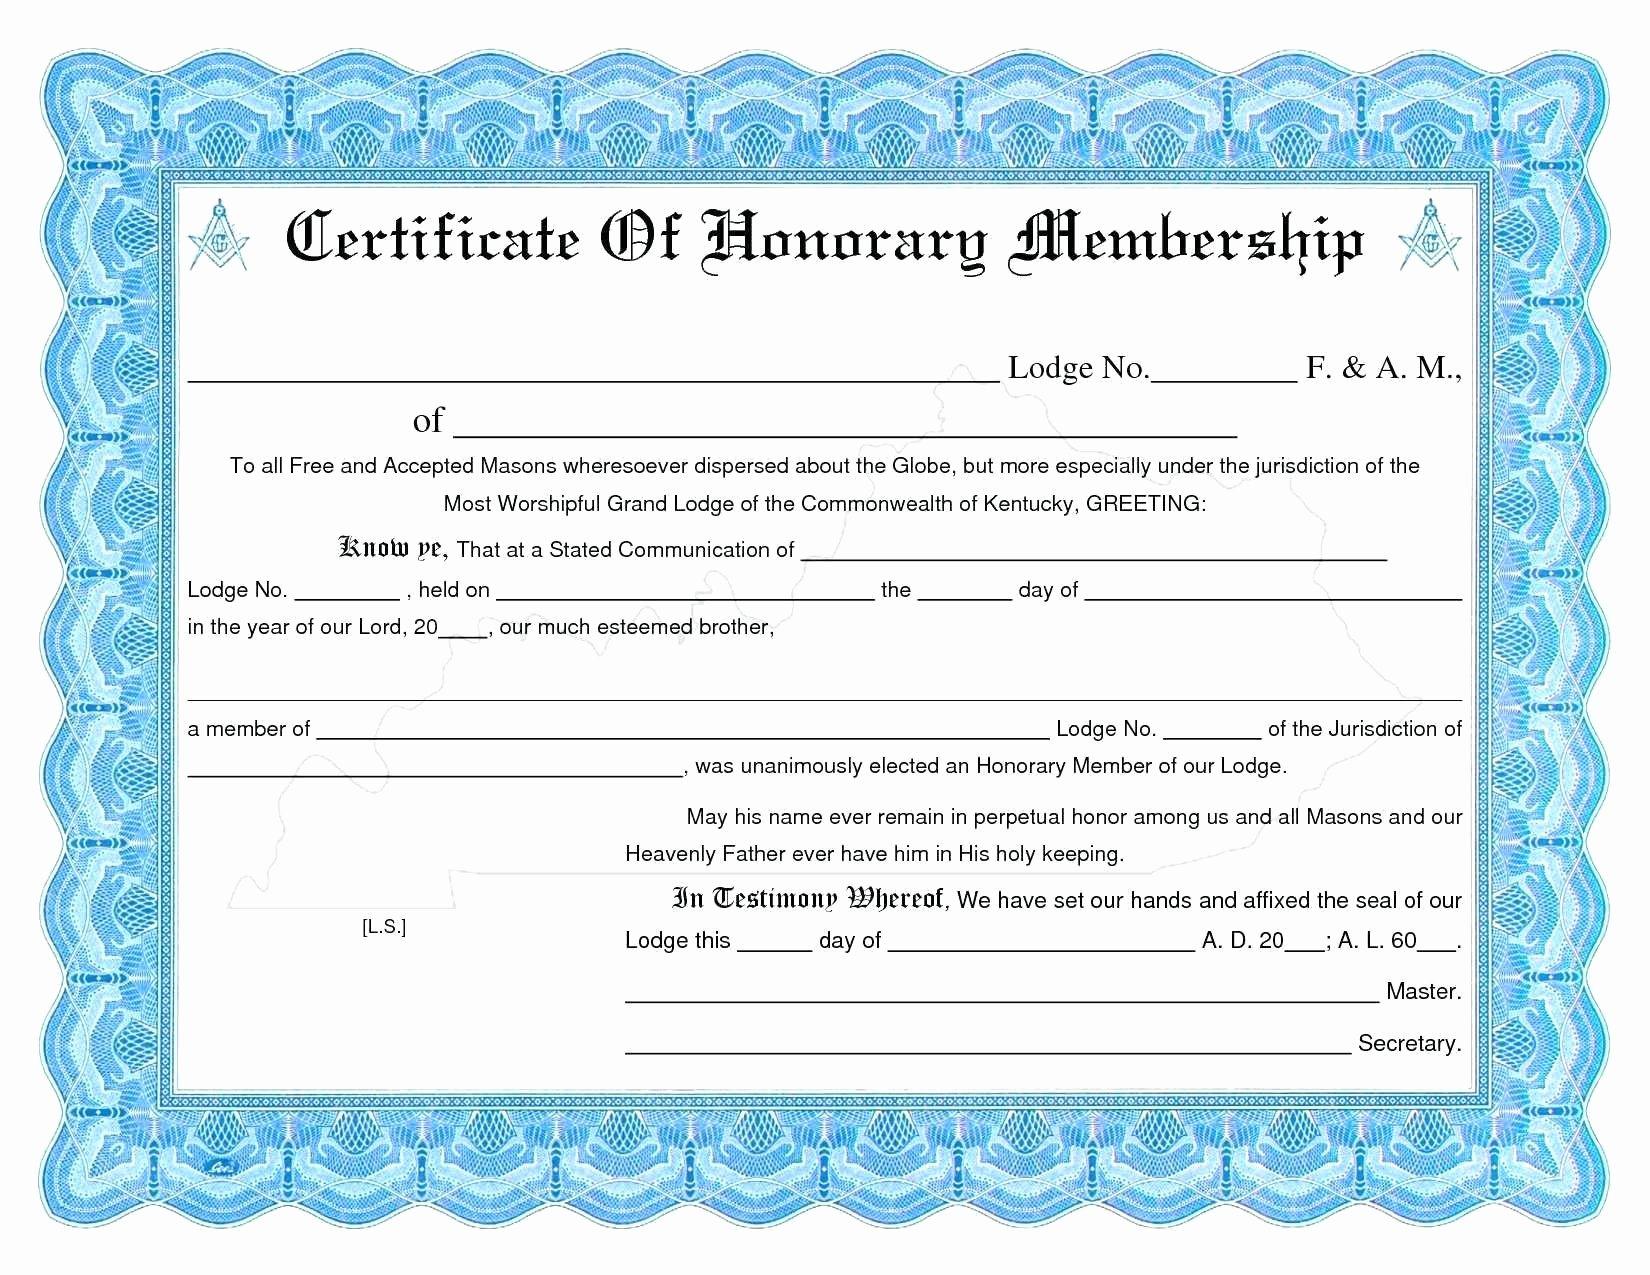 llc membership certificate template word certificate template word best of membership certificate template word unique membership certificate of deposit citibank